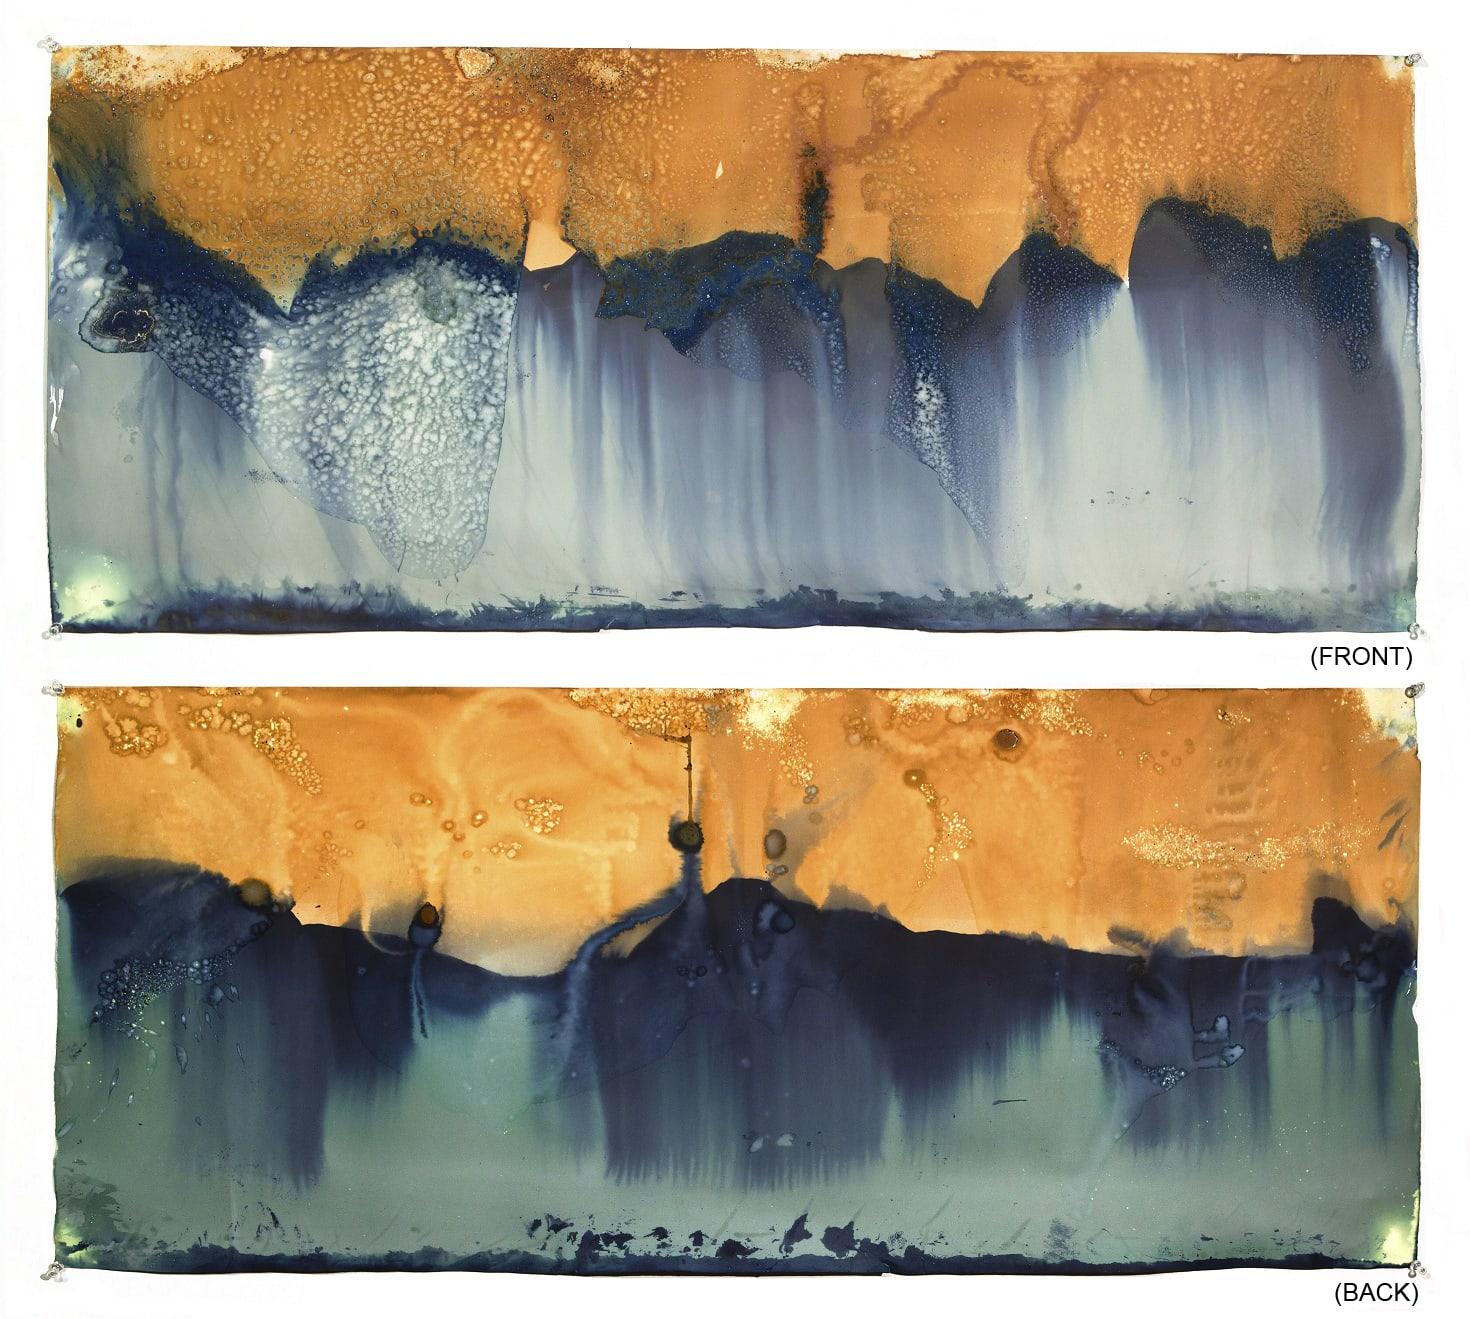 Meghann Riepenhoff 梅根·瑞普霍夫, Littoral Drift 05 (RectoVerso, Rode Beach, CA 08.01.13, Two Waves, Dipped), 2013